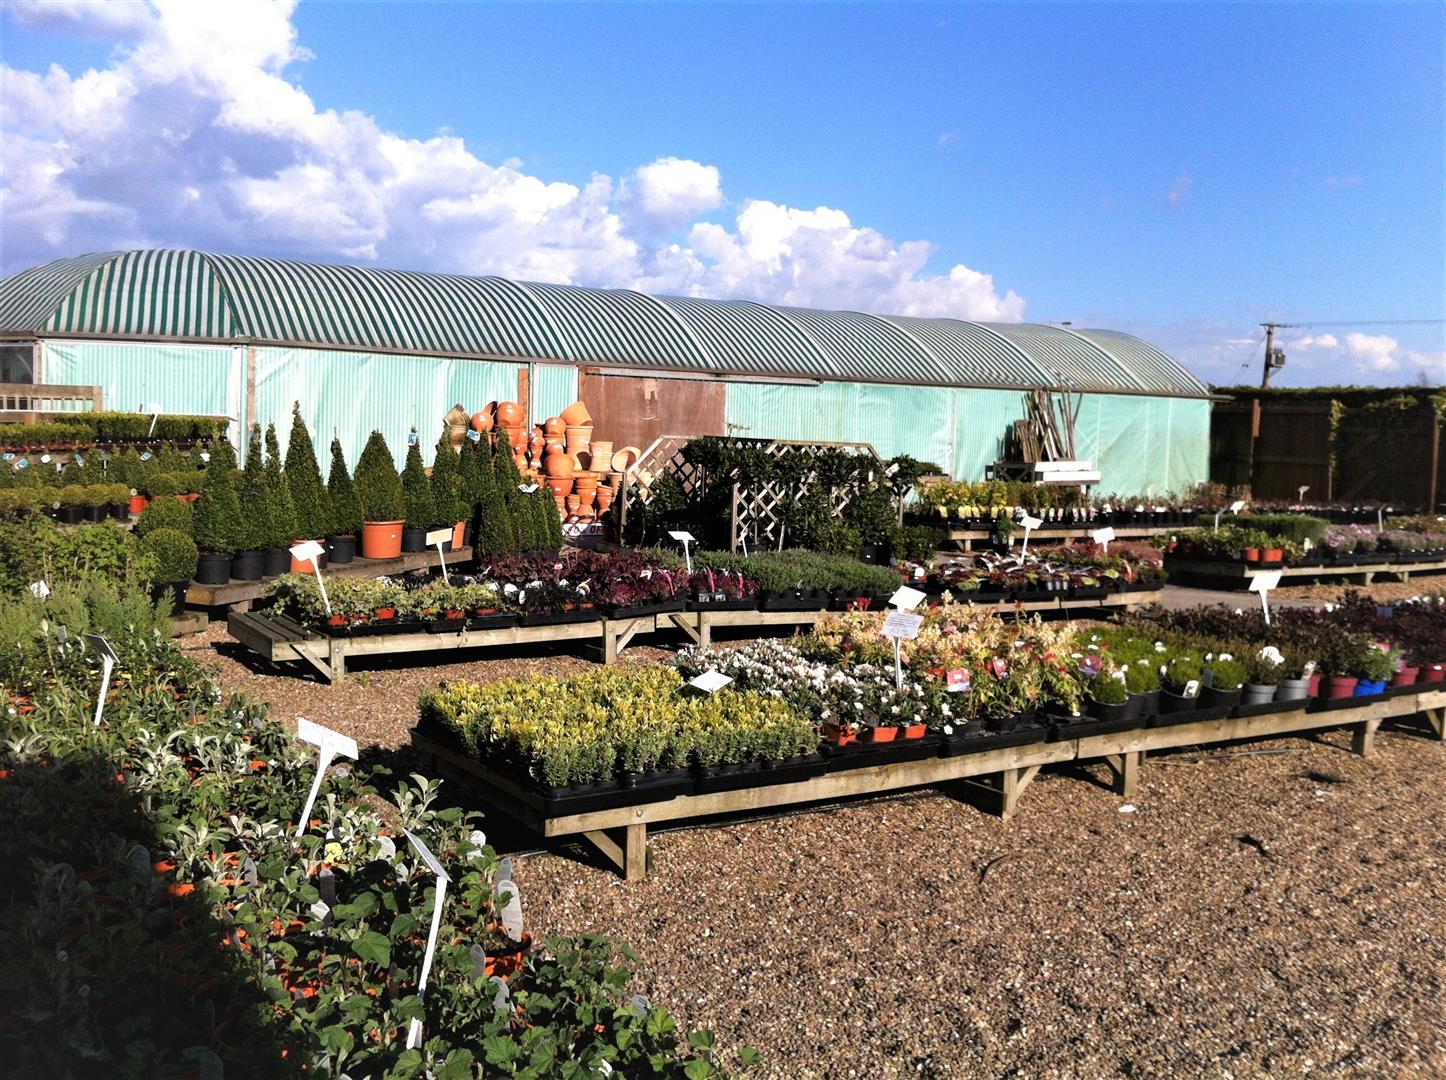 Middle Lane Nursery & Garden Centre, Middle Lane Nursery & Garden Centre, Preston, Hull, HU12 8TQ